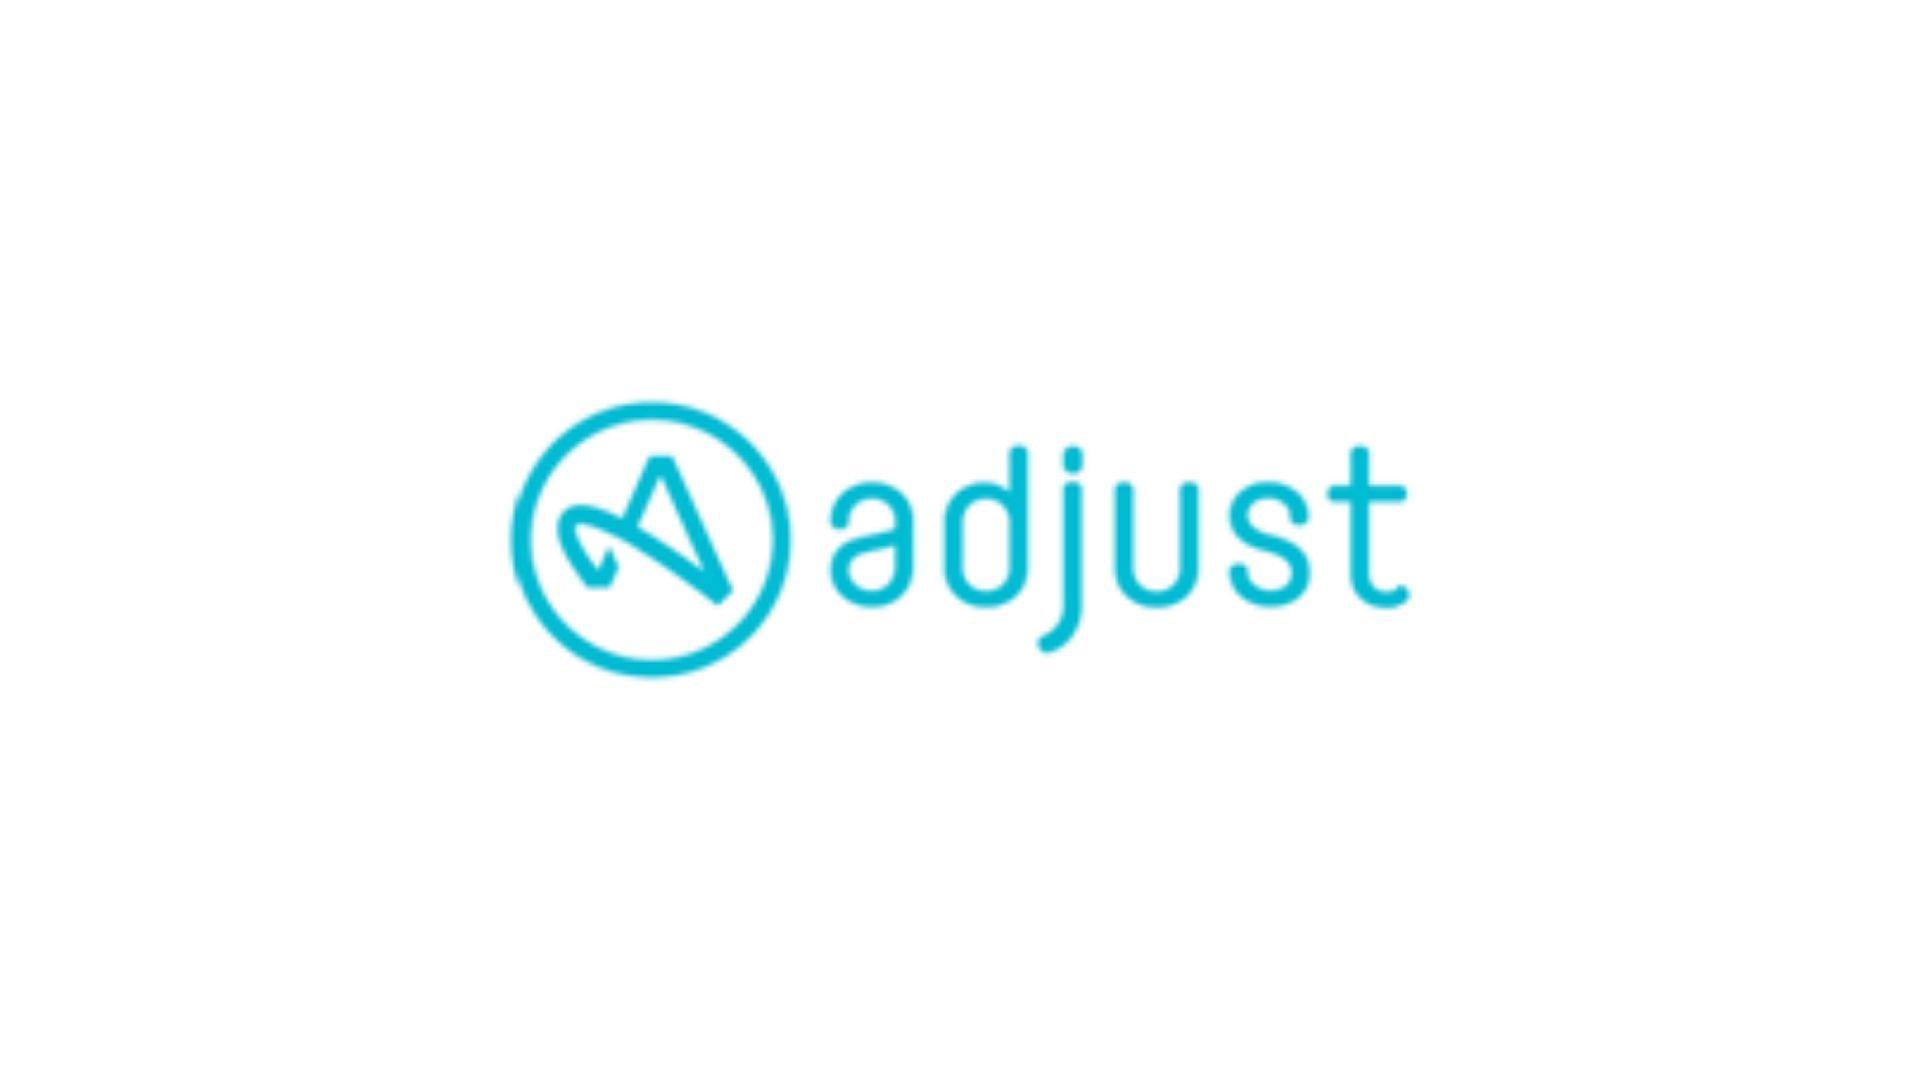 adjust?blur=25